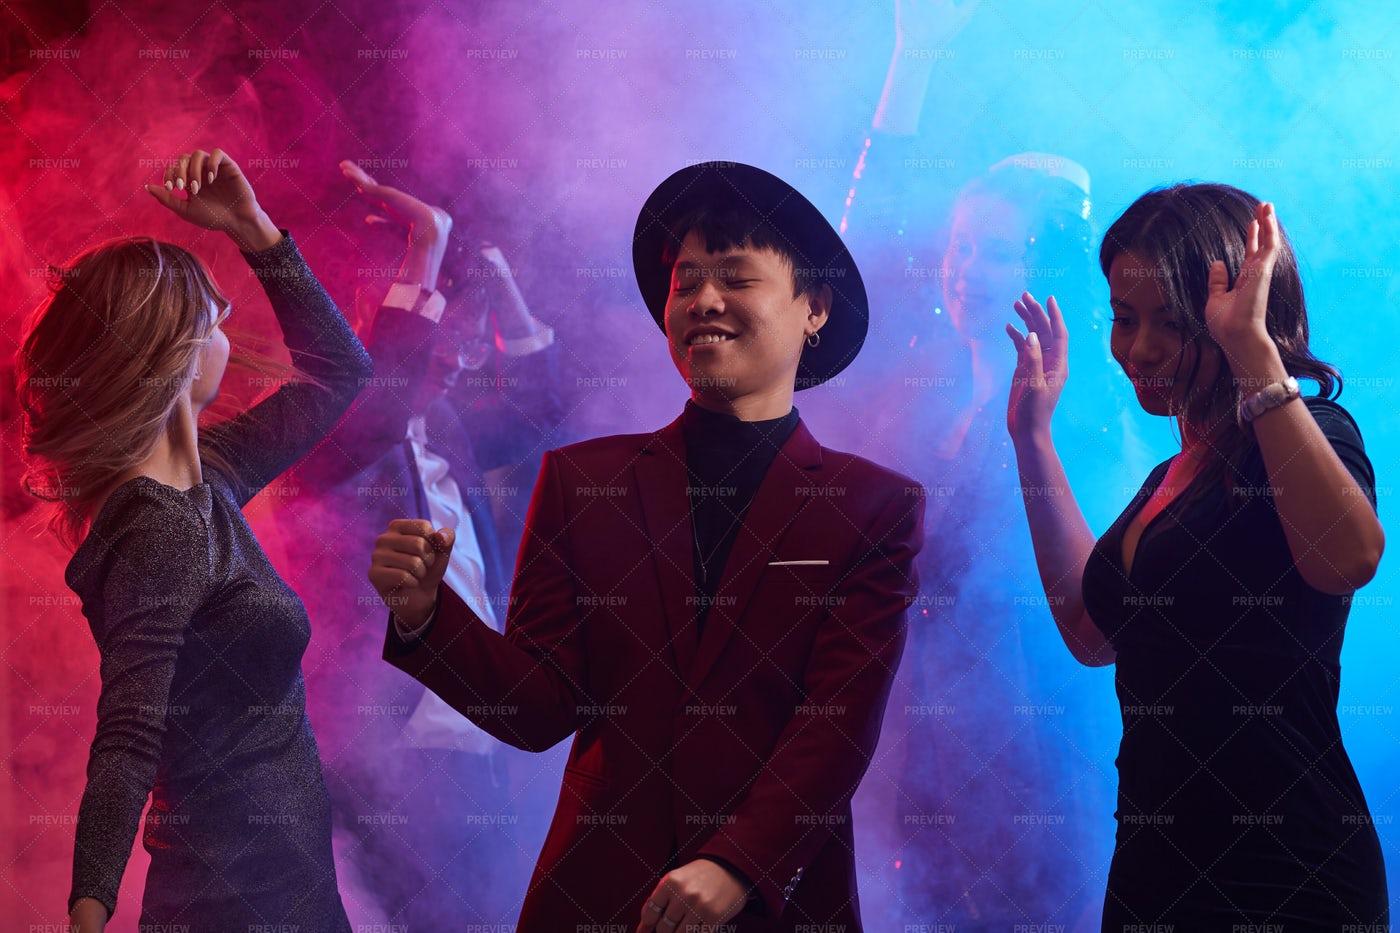 People Dancing In Smoky Nightclub: Stock Photos